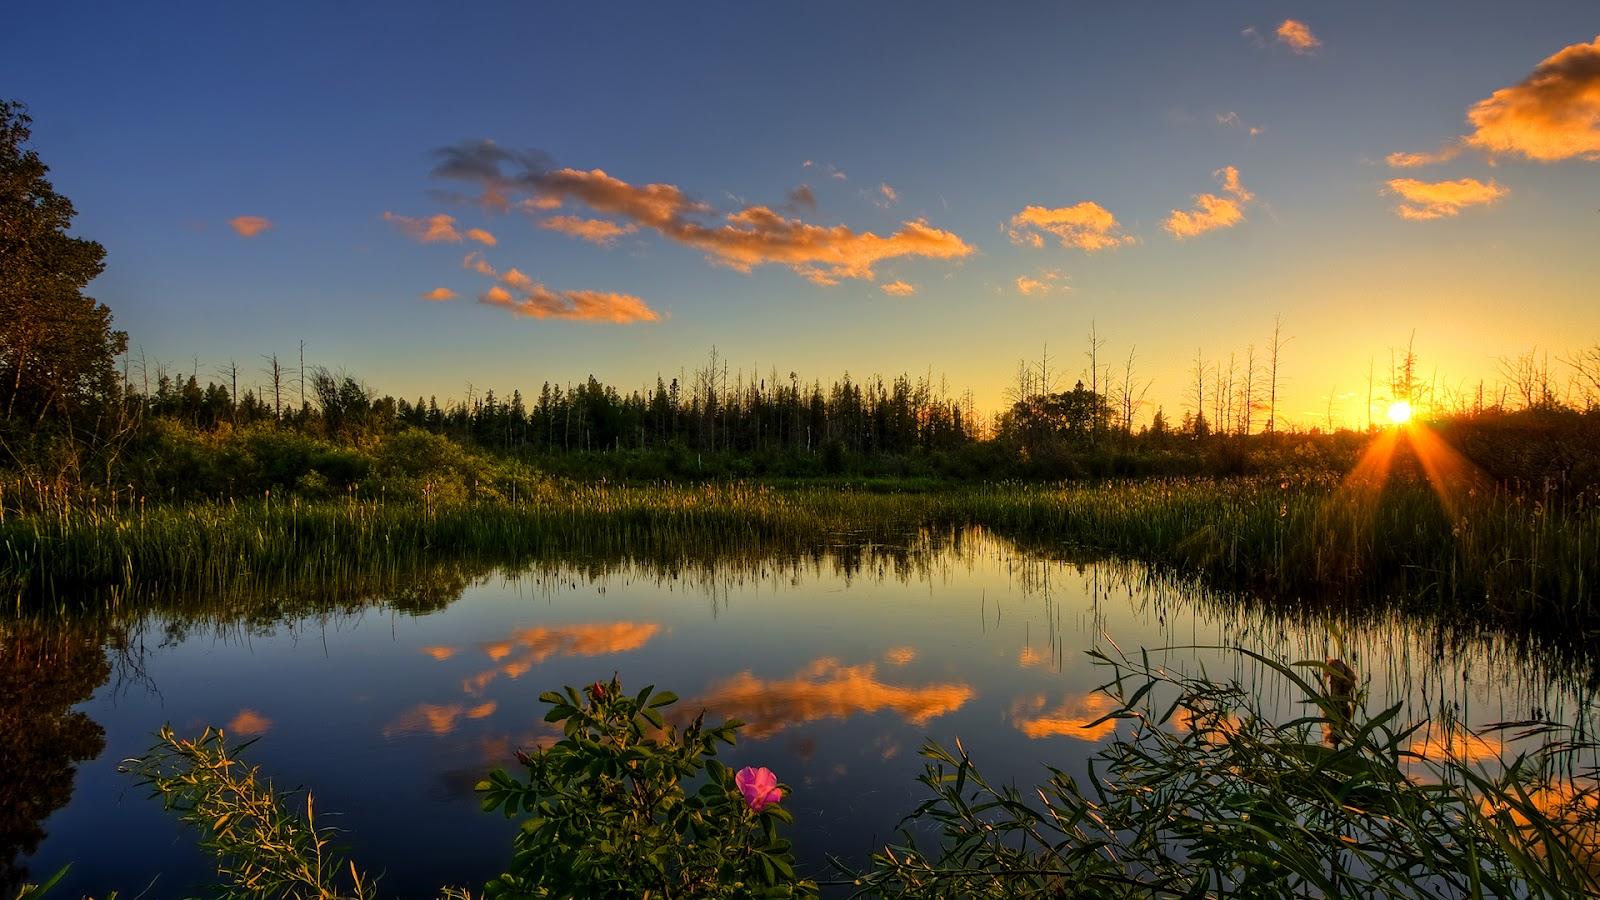 sky_nature_purity